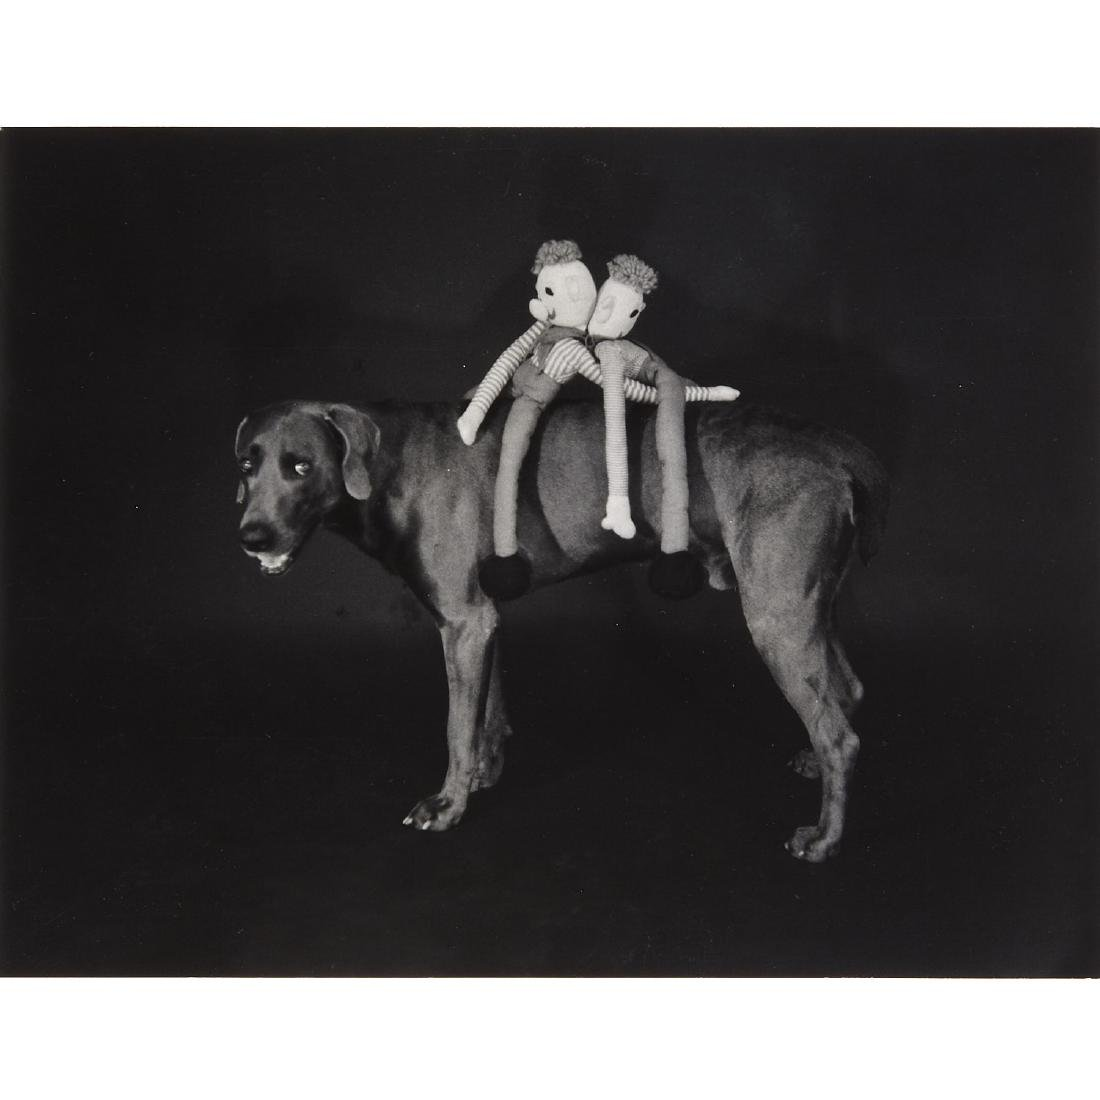 William Wegman, photograph